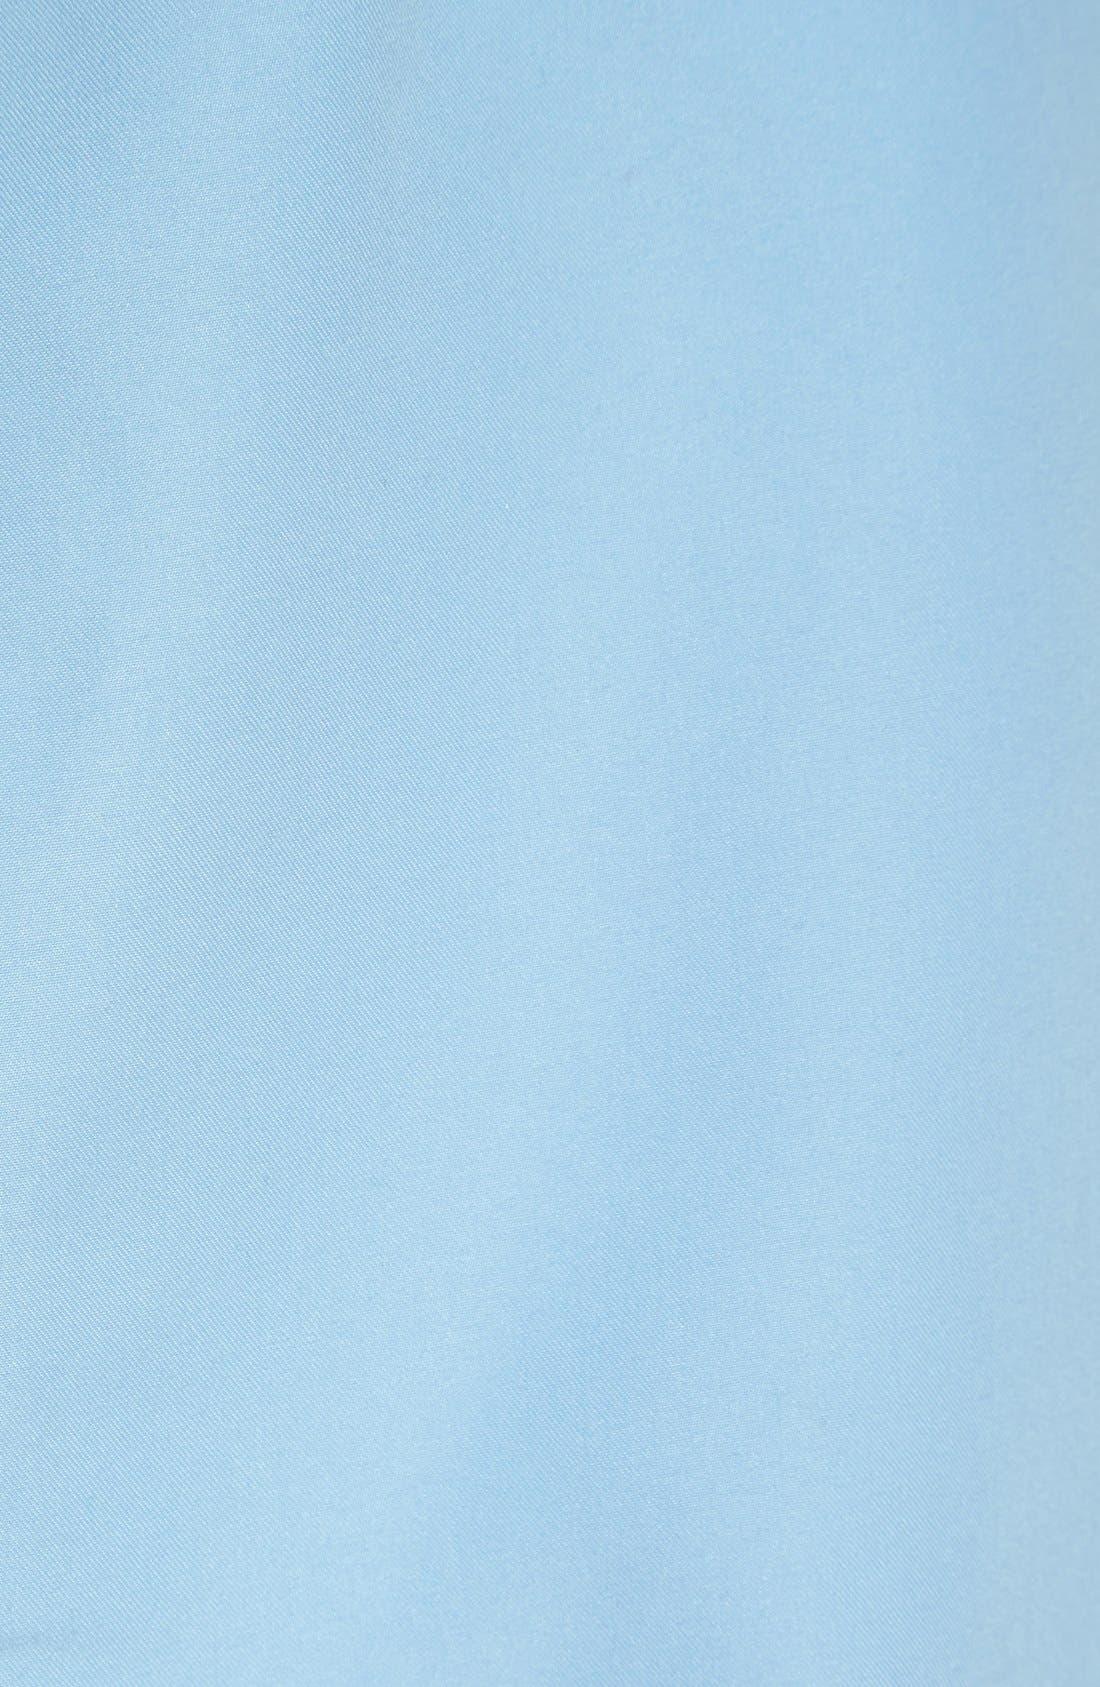 Alternate Image 3  - Vineyard Vines 'Bungalow - Solid' Swim Trunks